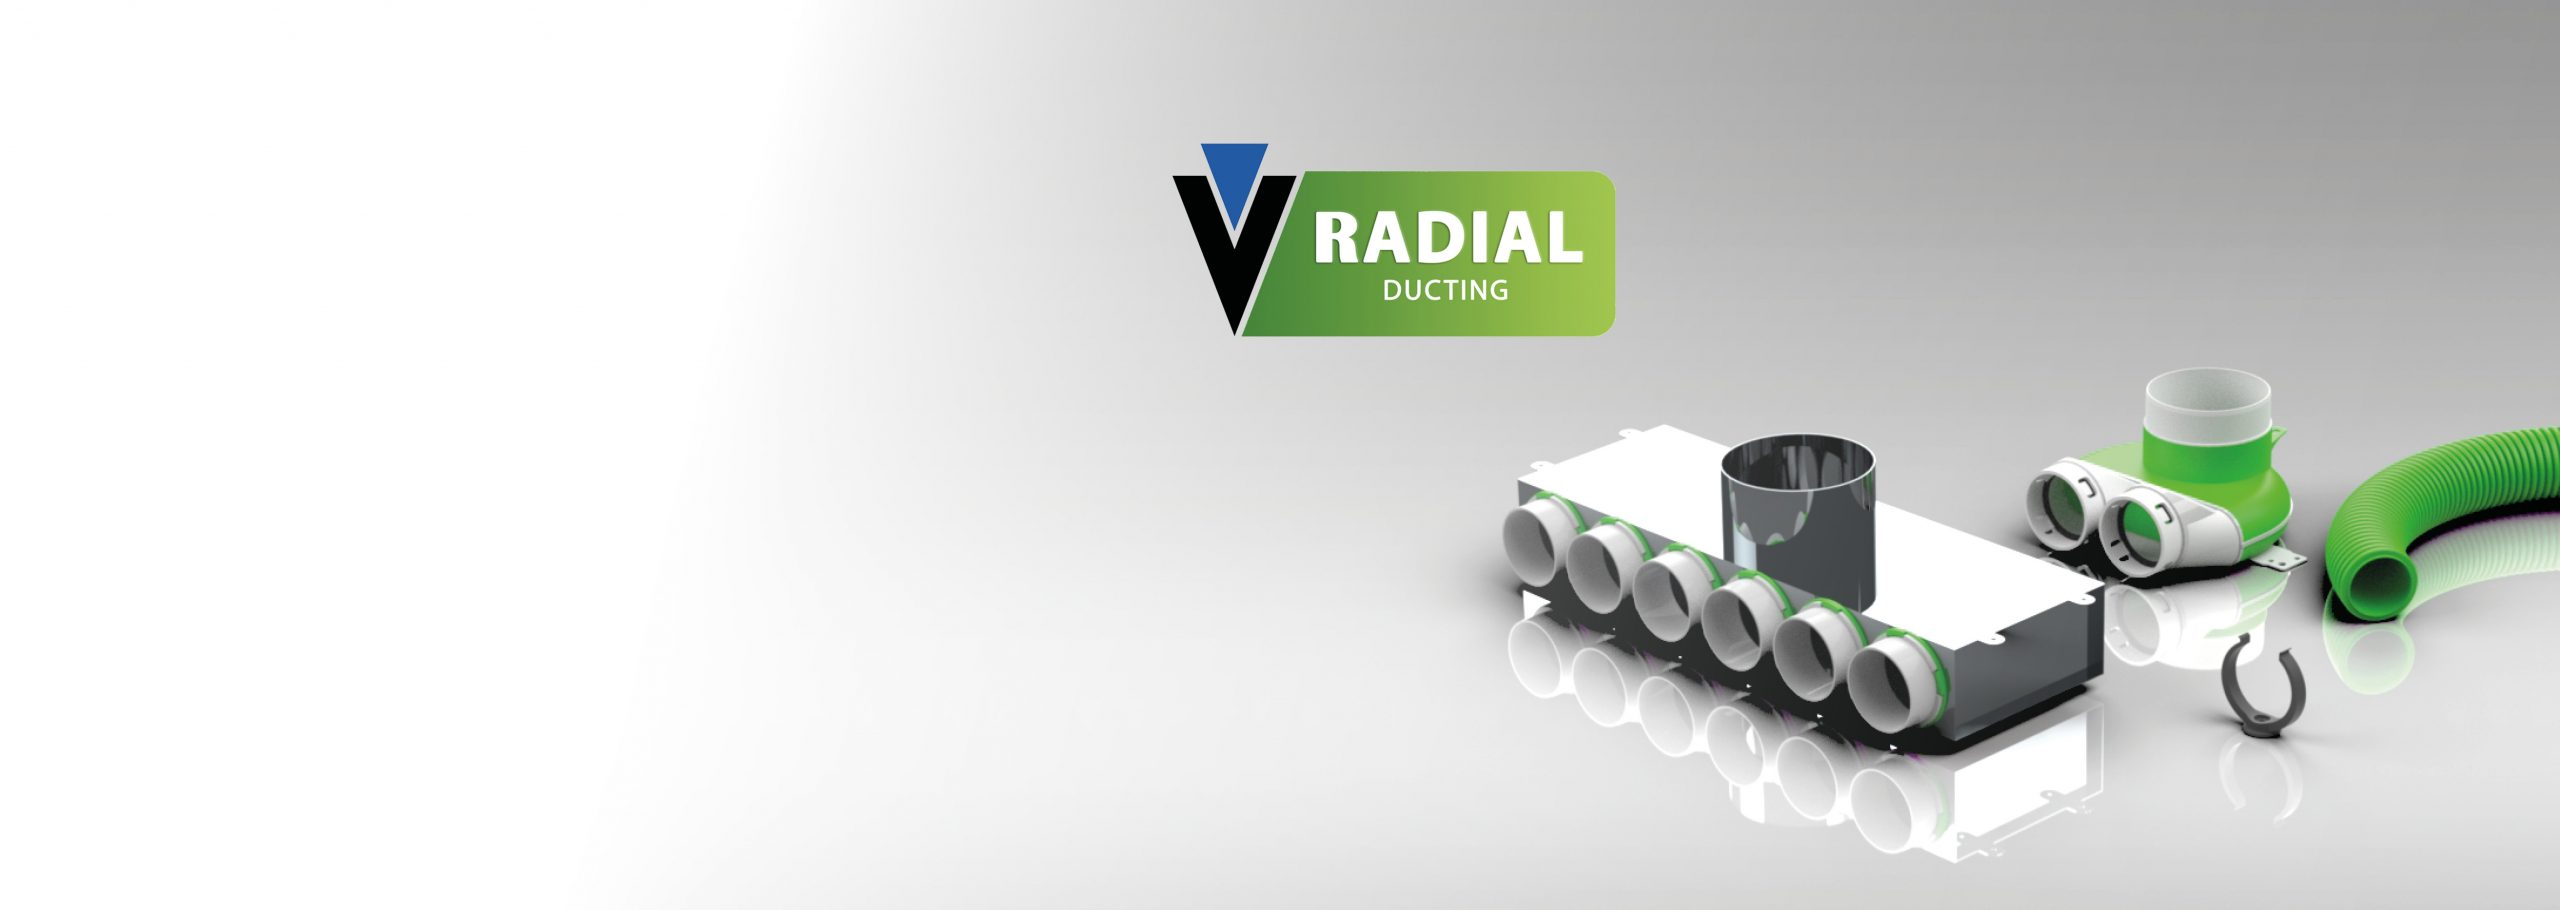 radial-scaled_b0c61e9c5b1590fee1b2f3e3409ea76e